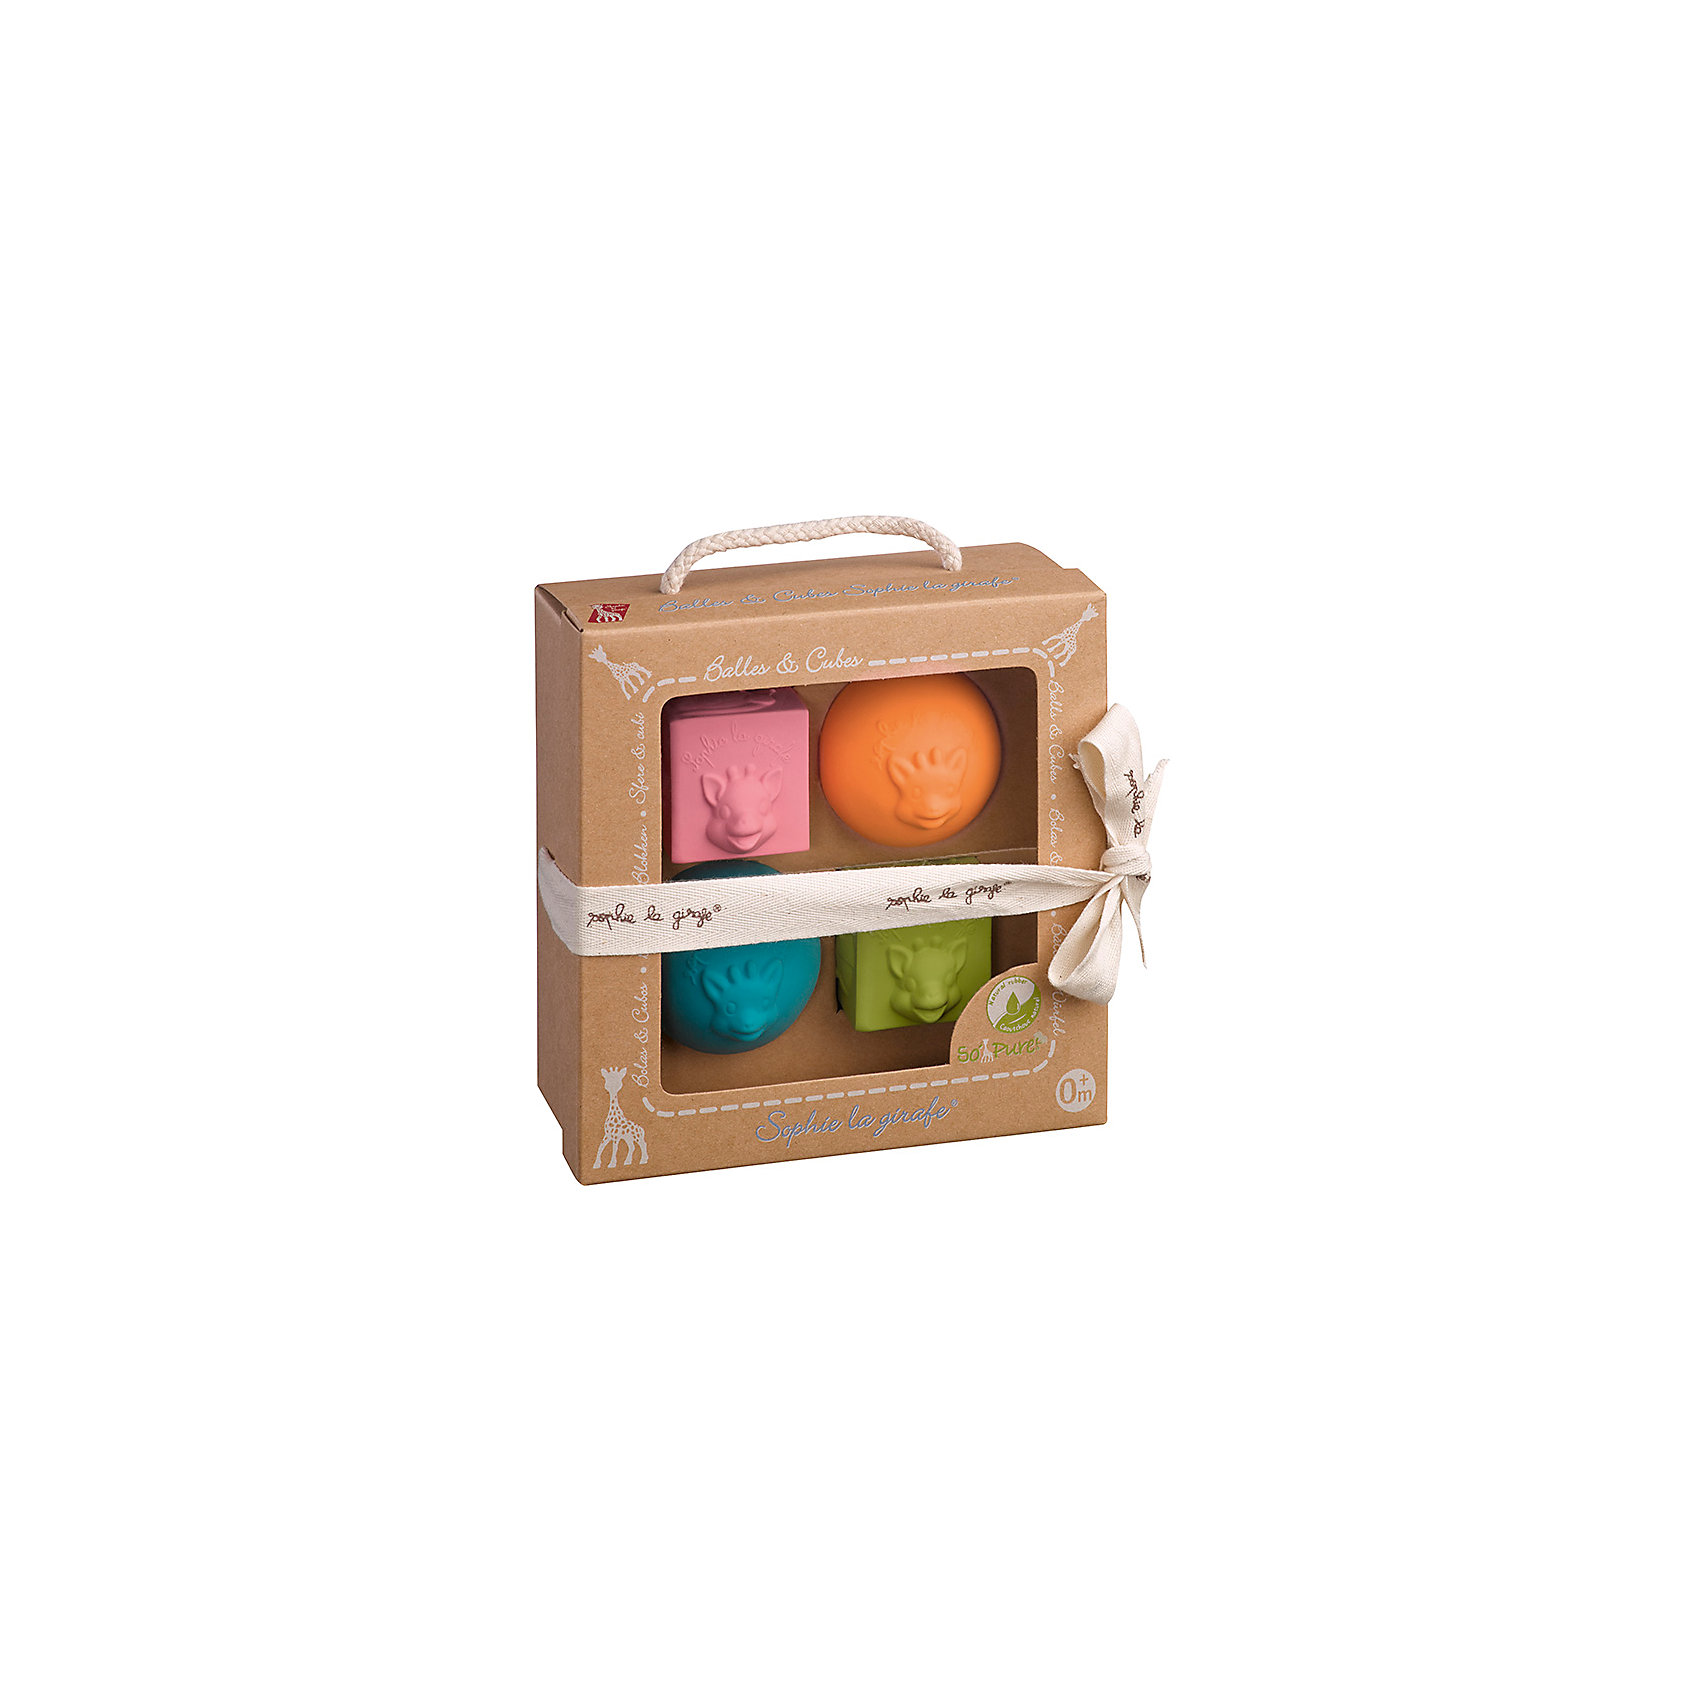 Игрушки в наборе: мячики, кубики, VulliРазвивающие игрушки<br><br><br>Ширина мм: 160<br>Глубина мм: 80<br>Высота мм: 160<br>Вес г: 121<br>Возраст от месяцев: 3<br>Возраст до месяцев: 2147483647<br>Пол: Унисекс<br>Возраст: Детский<br>SKU: 6893351